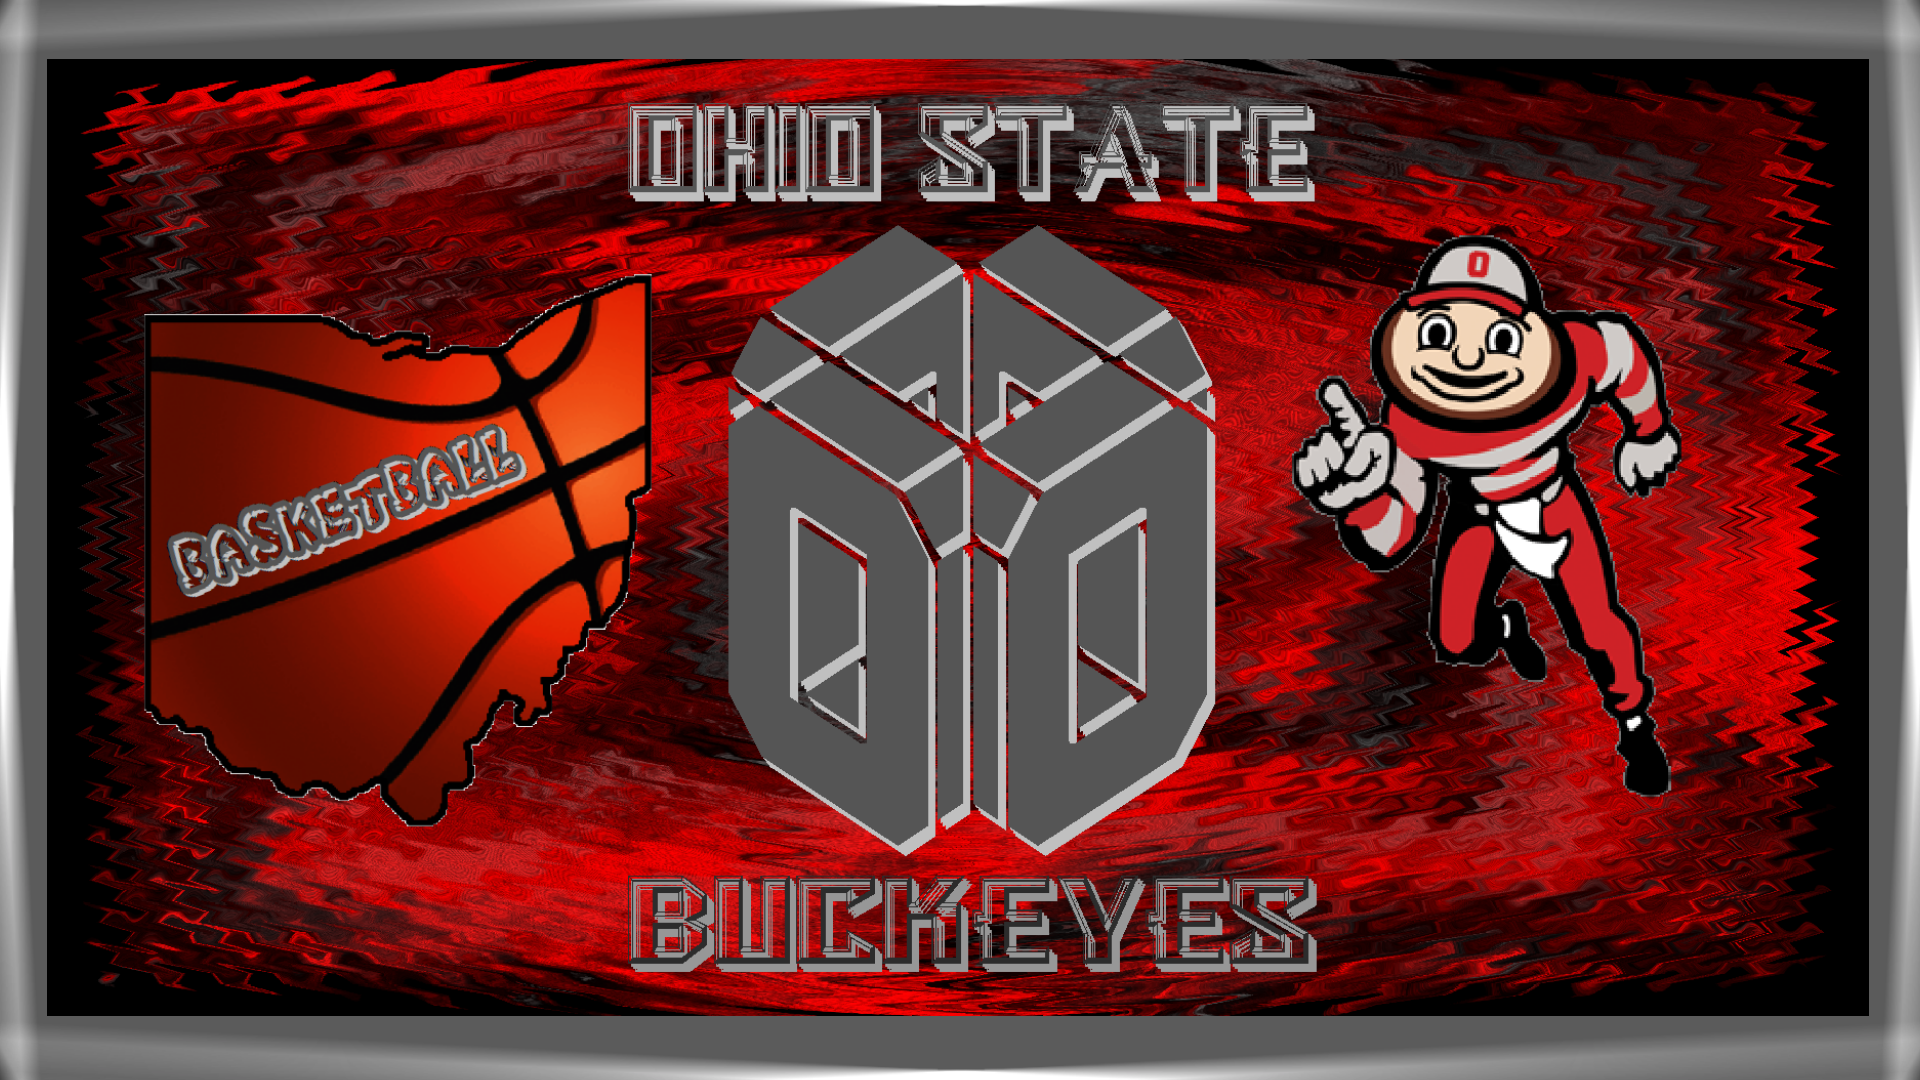 OHIO STATE BUCKEYES baloncesto fondo de pantalla